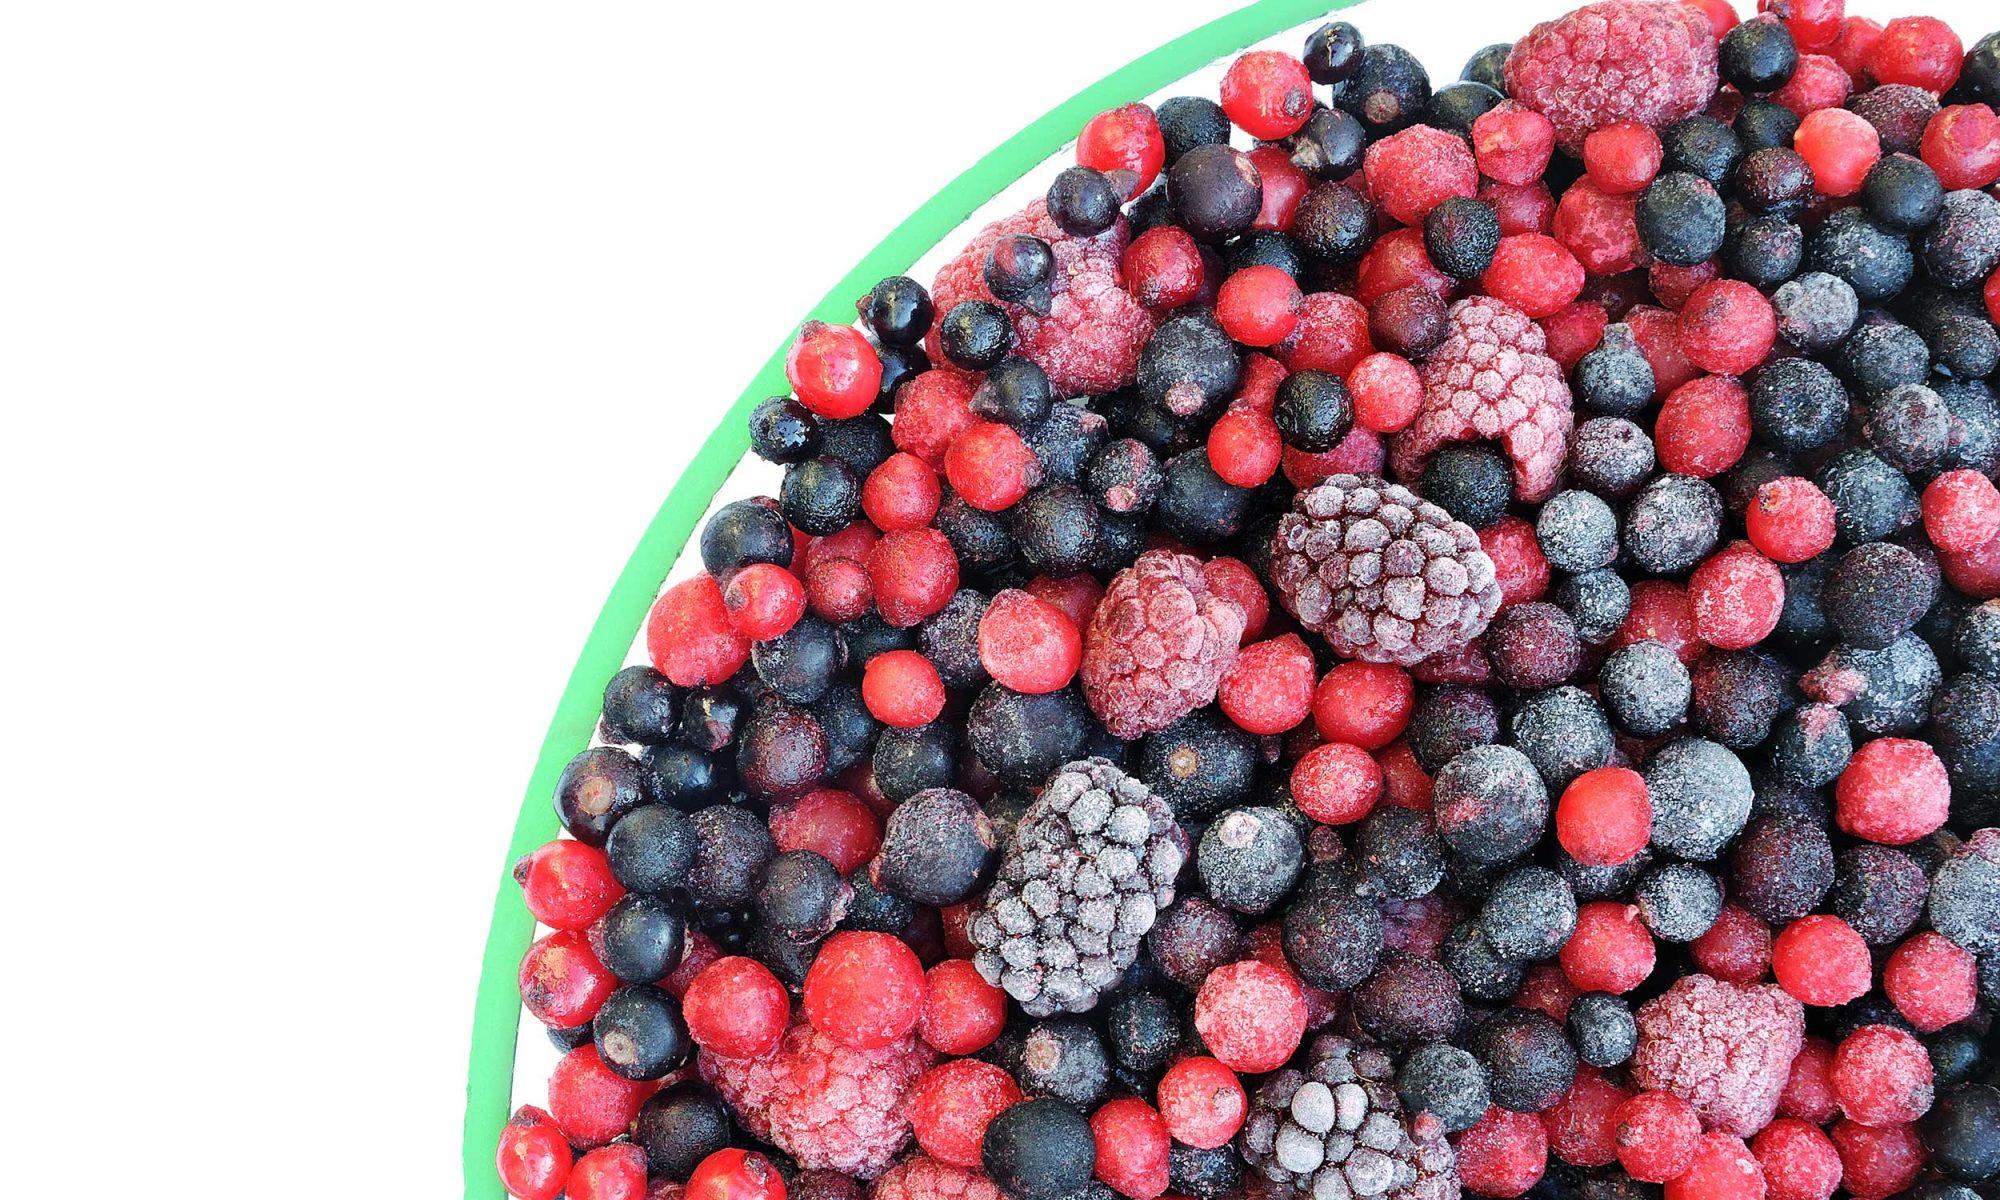 EC: Is Frozen Produce Healthier Than Fresh Produce?